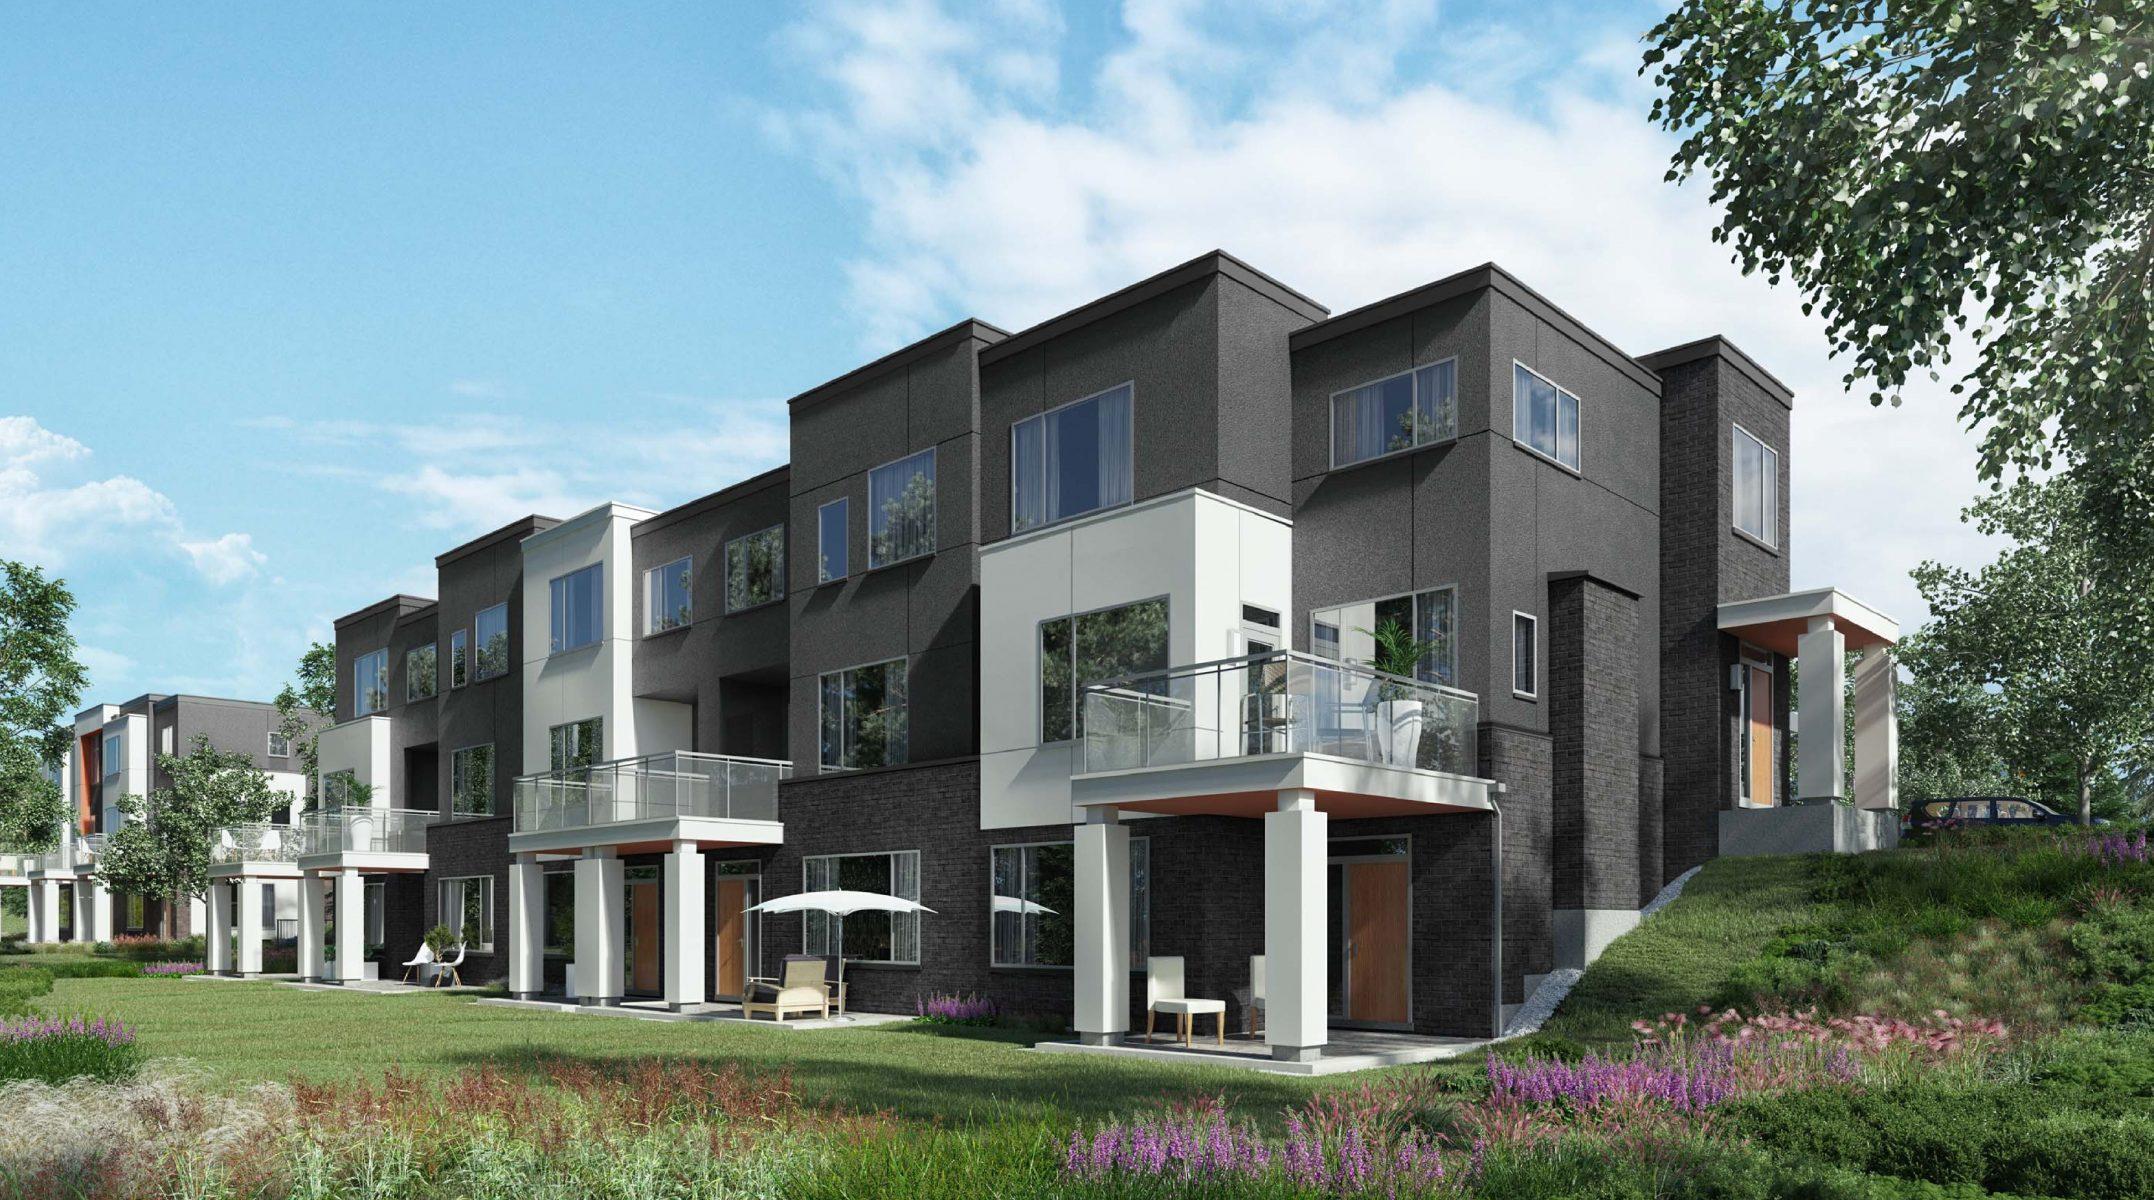 Korsiak Urban Planning - Oakville Portfolio - Dundas Street West, Greenfield Development - Oakville, Ontario